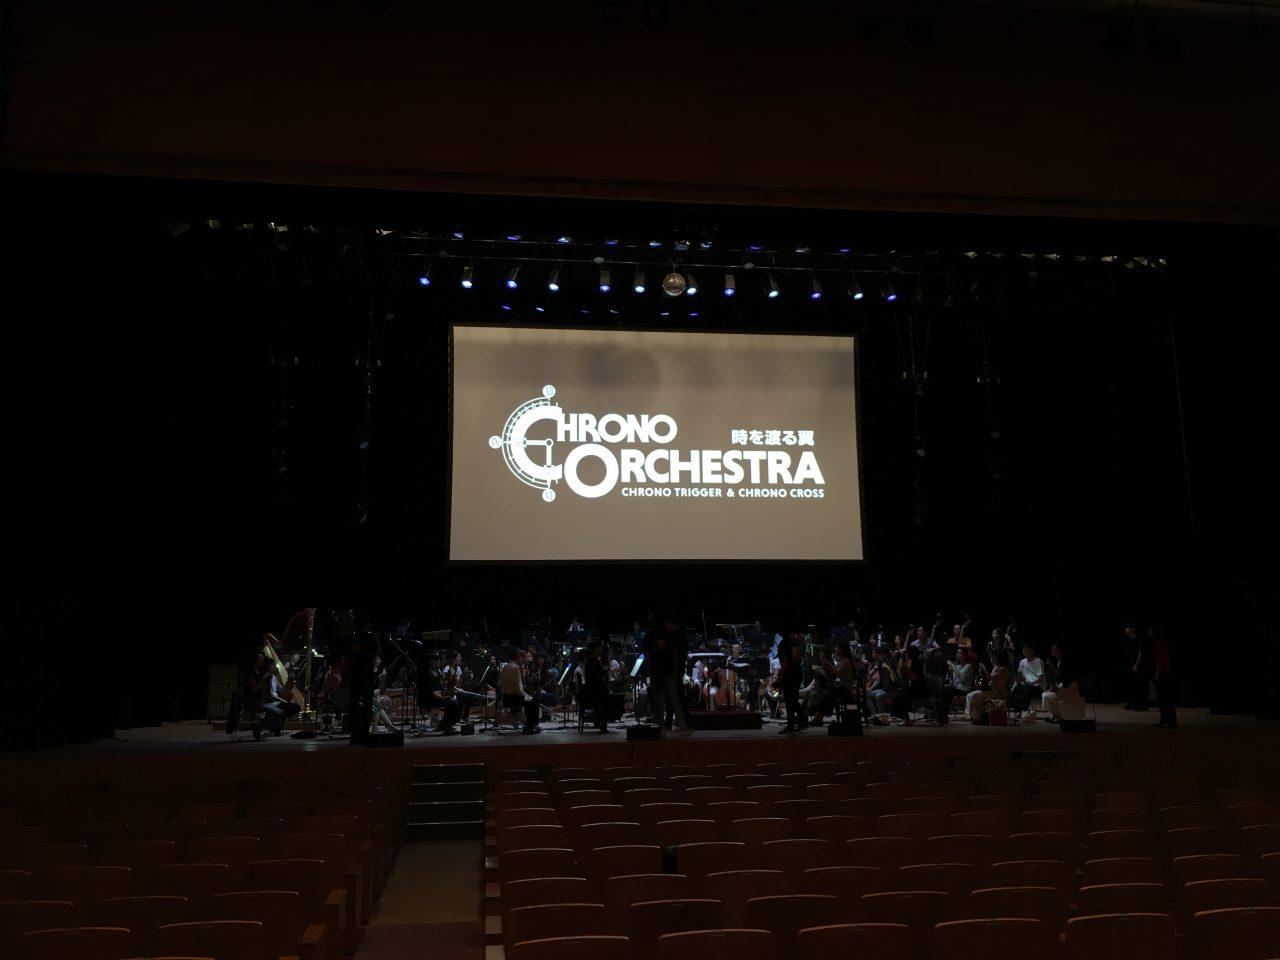 CHRONO ORCHESTRA